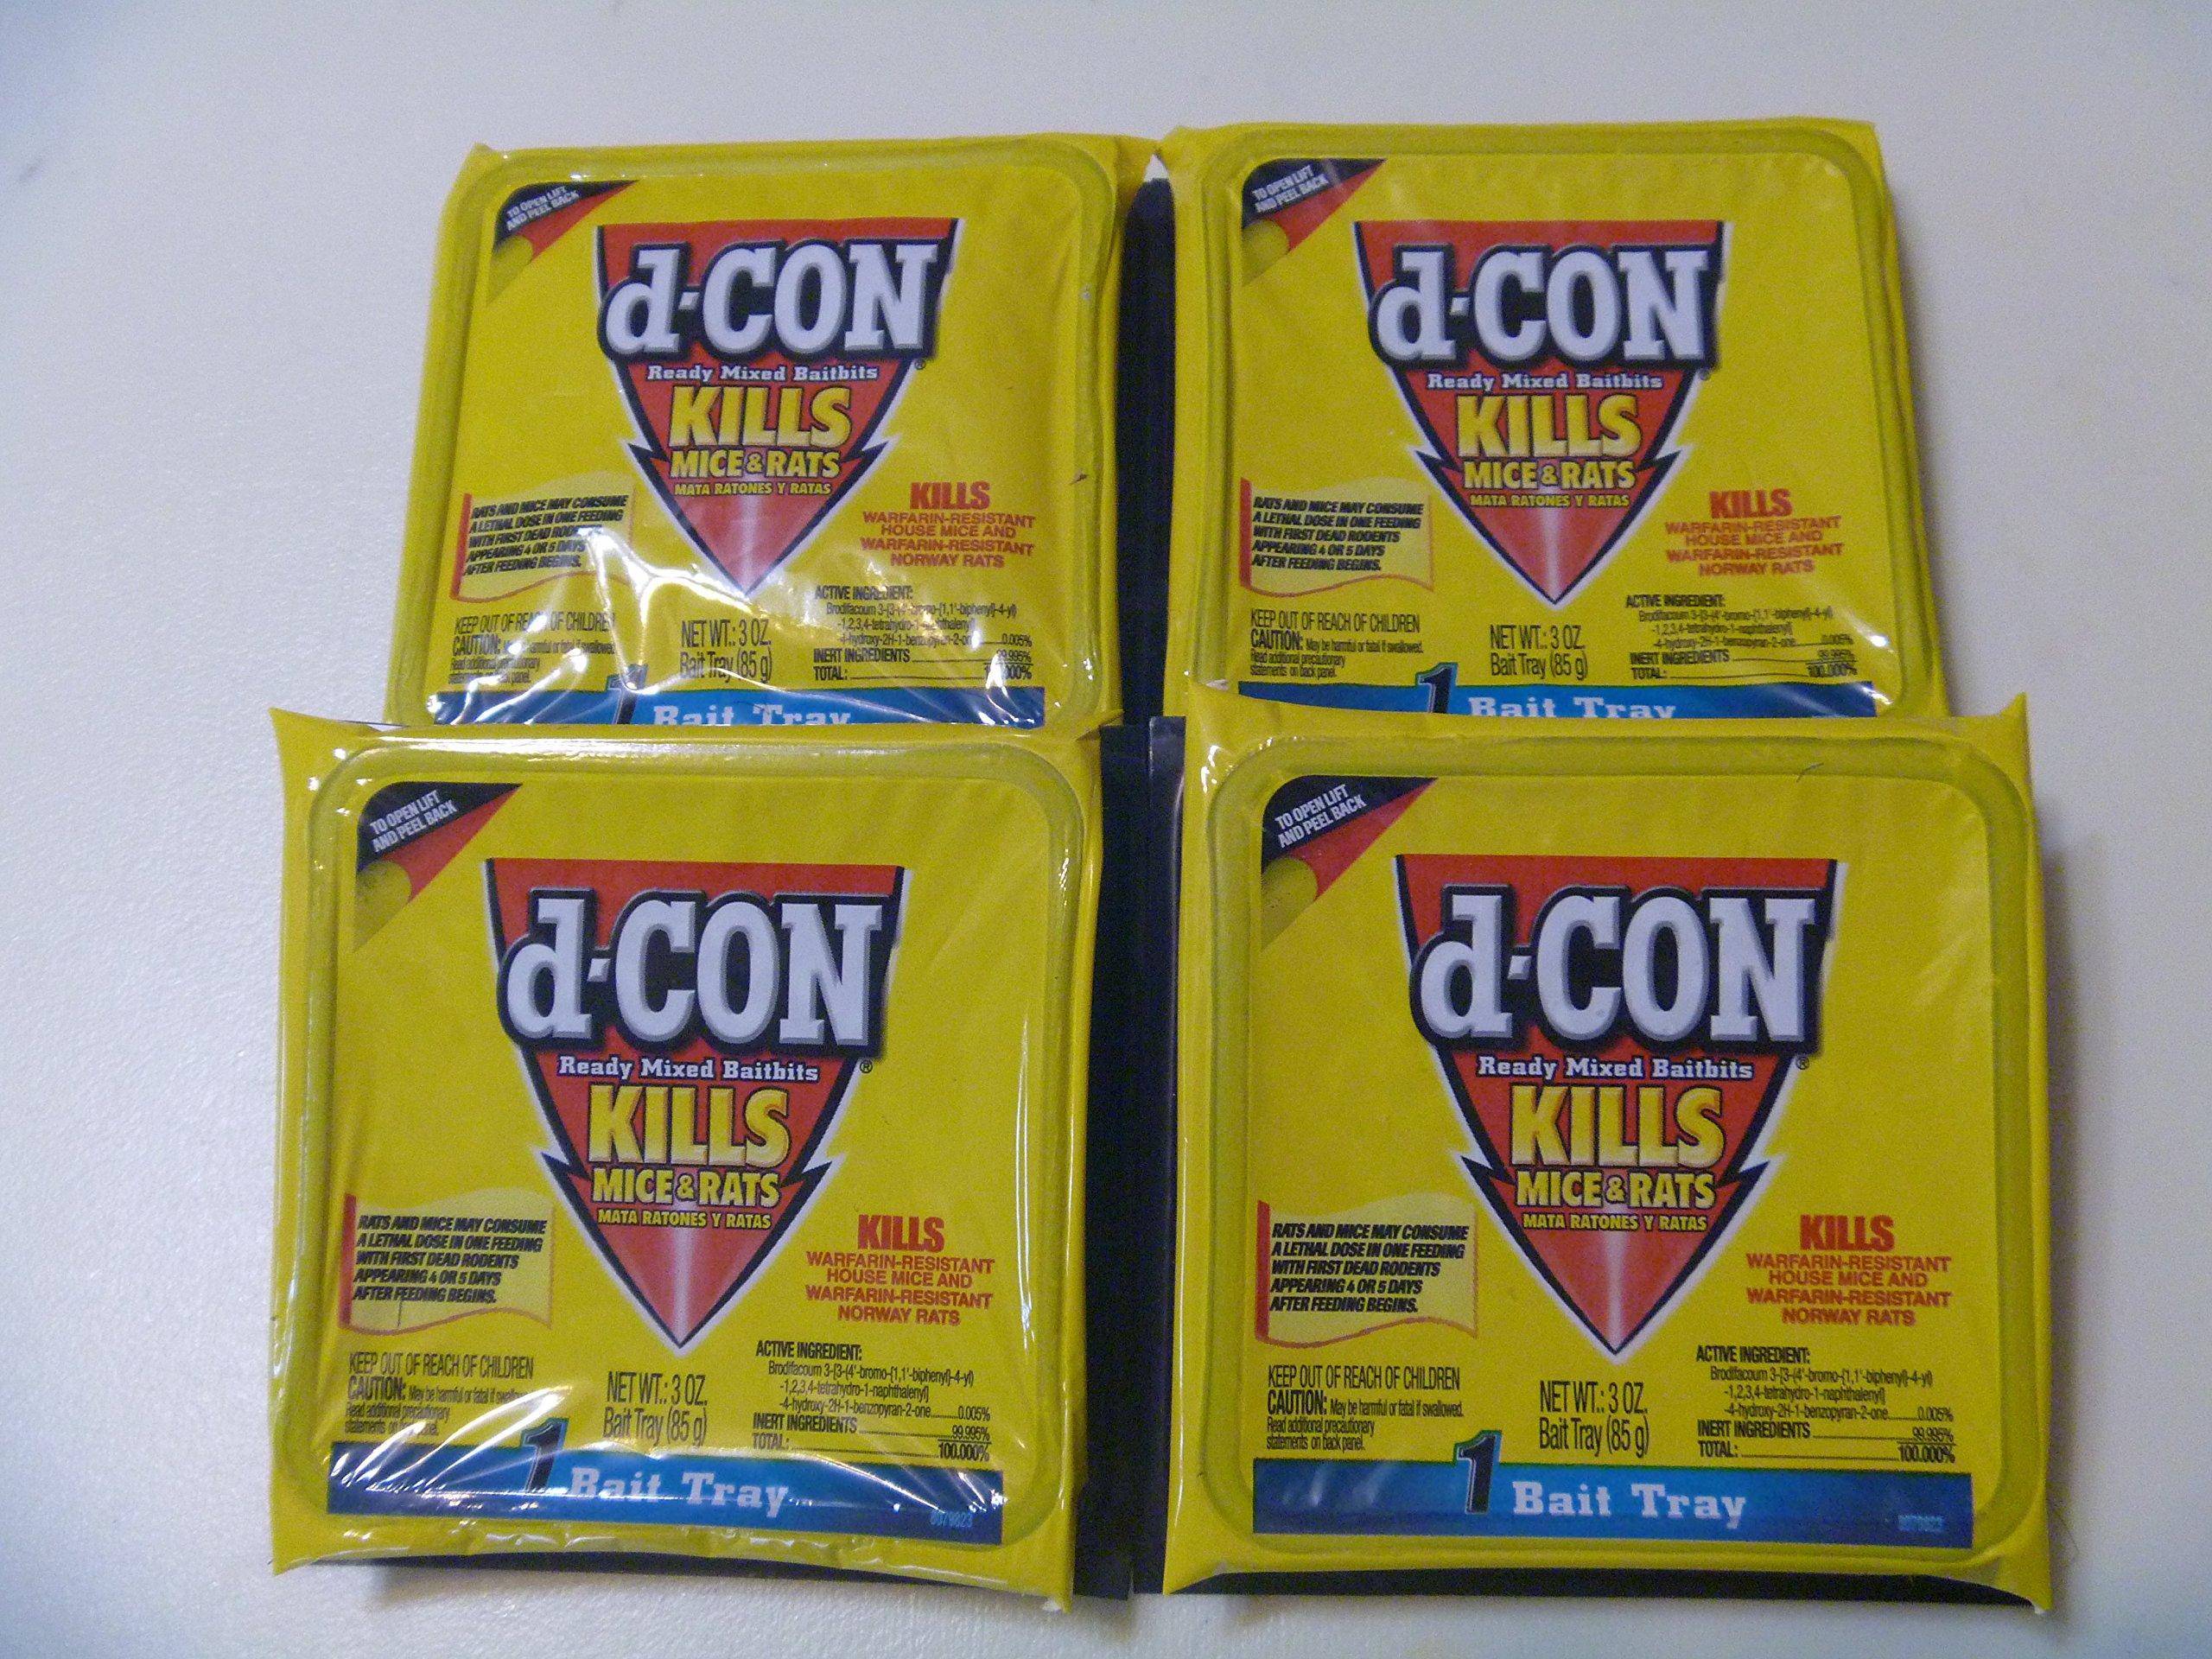 D-CON Ready Mixed Baitbits 4- 3 oz. Trays Rat Poison dcon